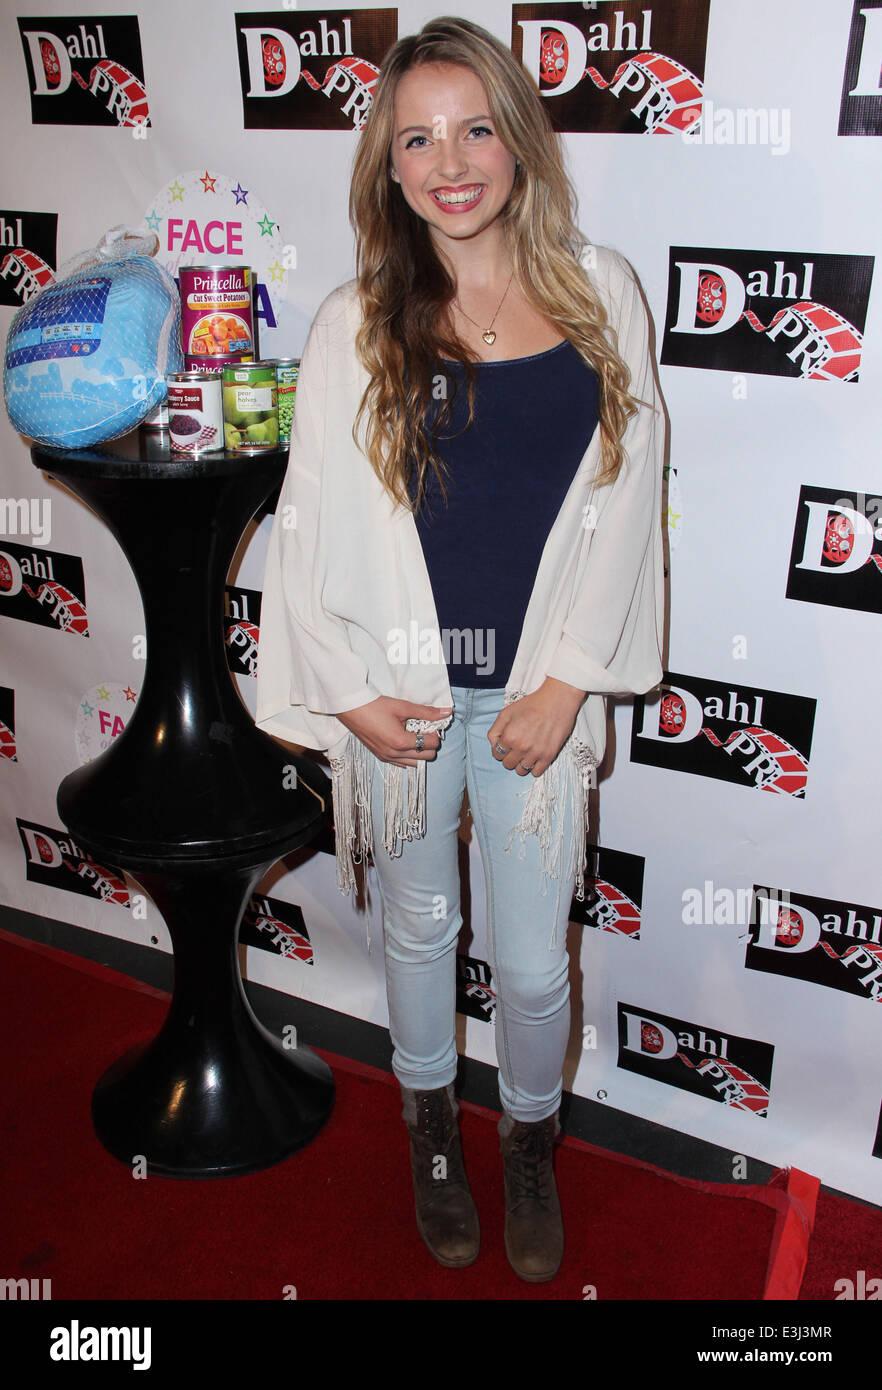 darby walker actress